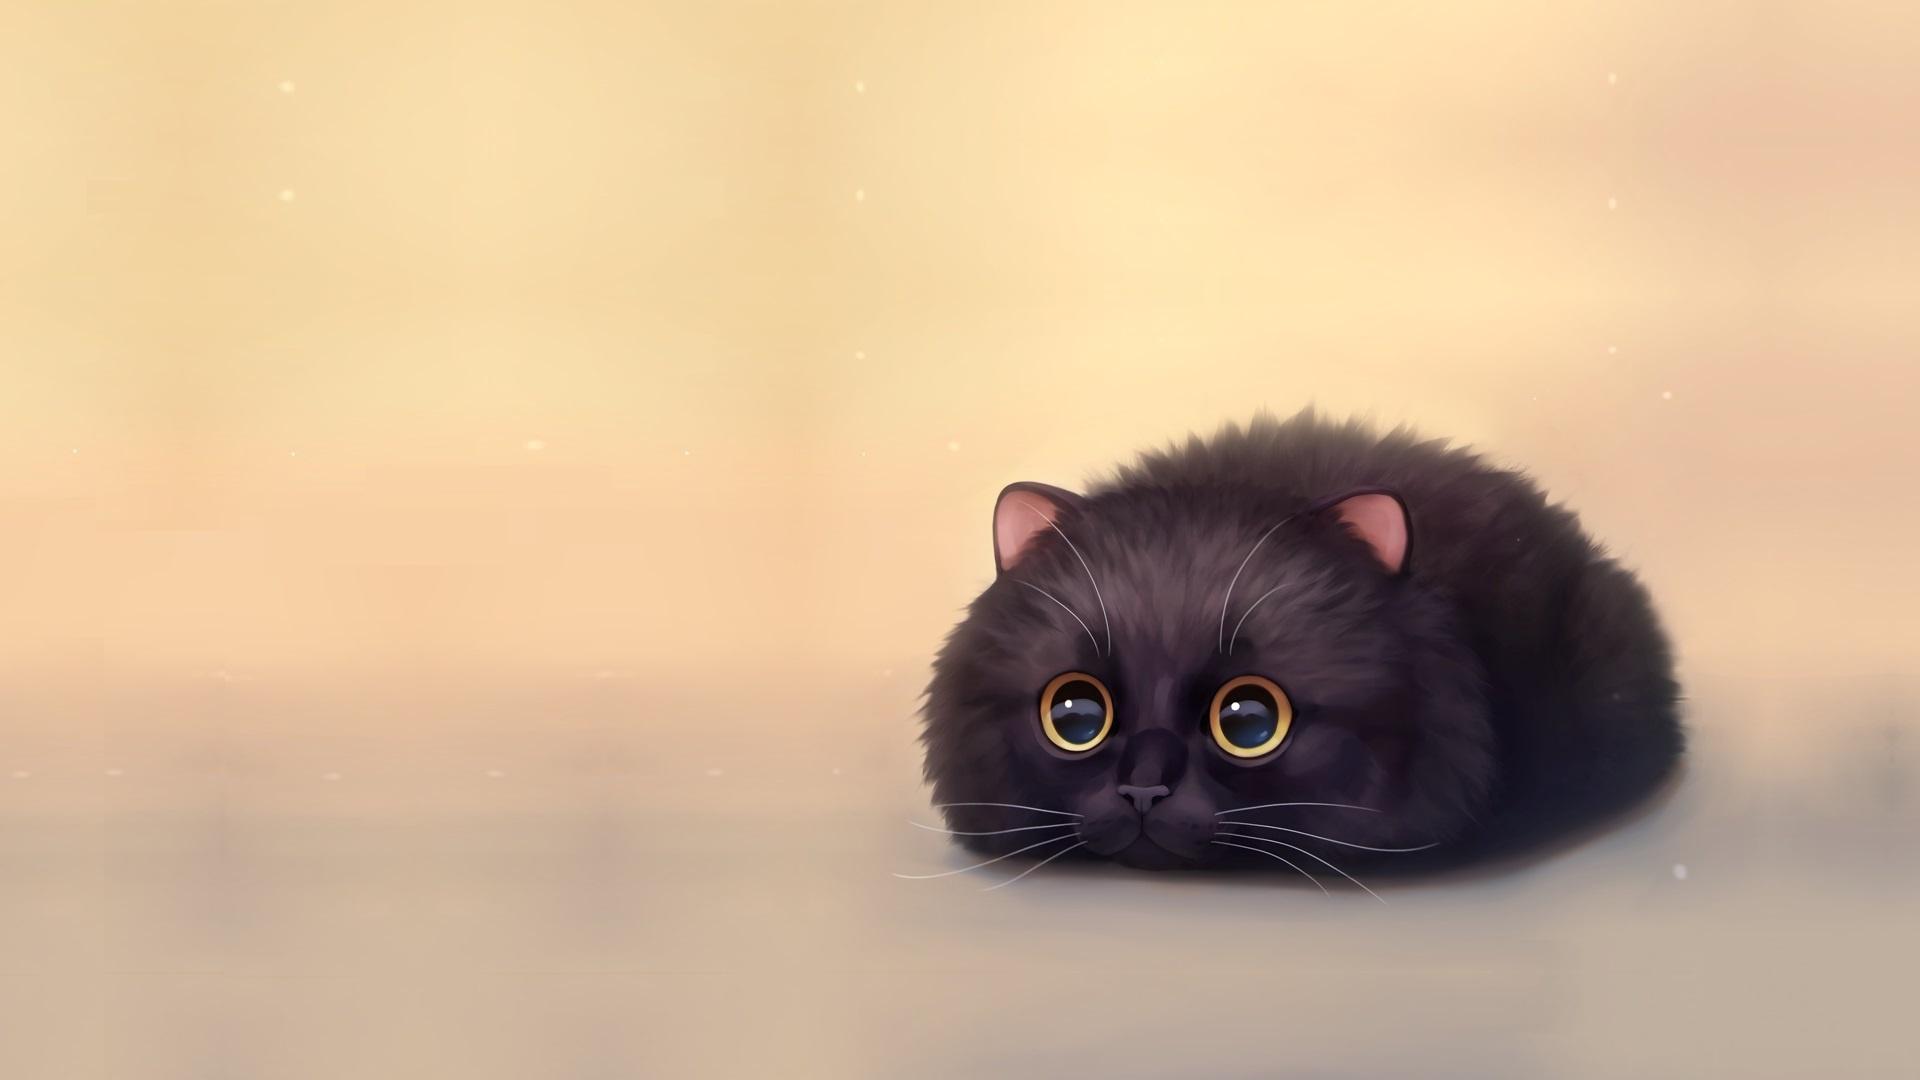 Animal With Big Eyes Art desktop background